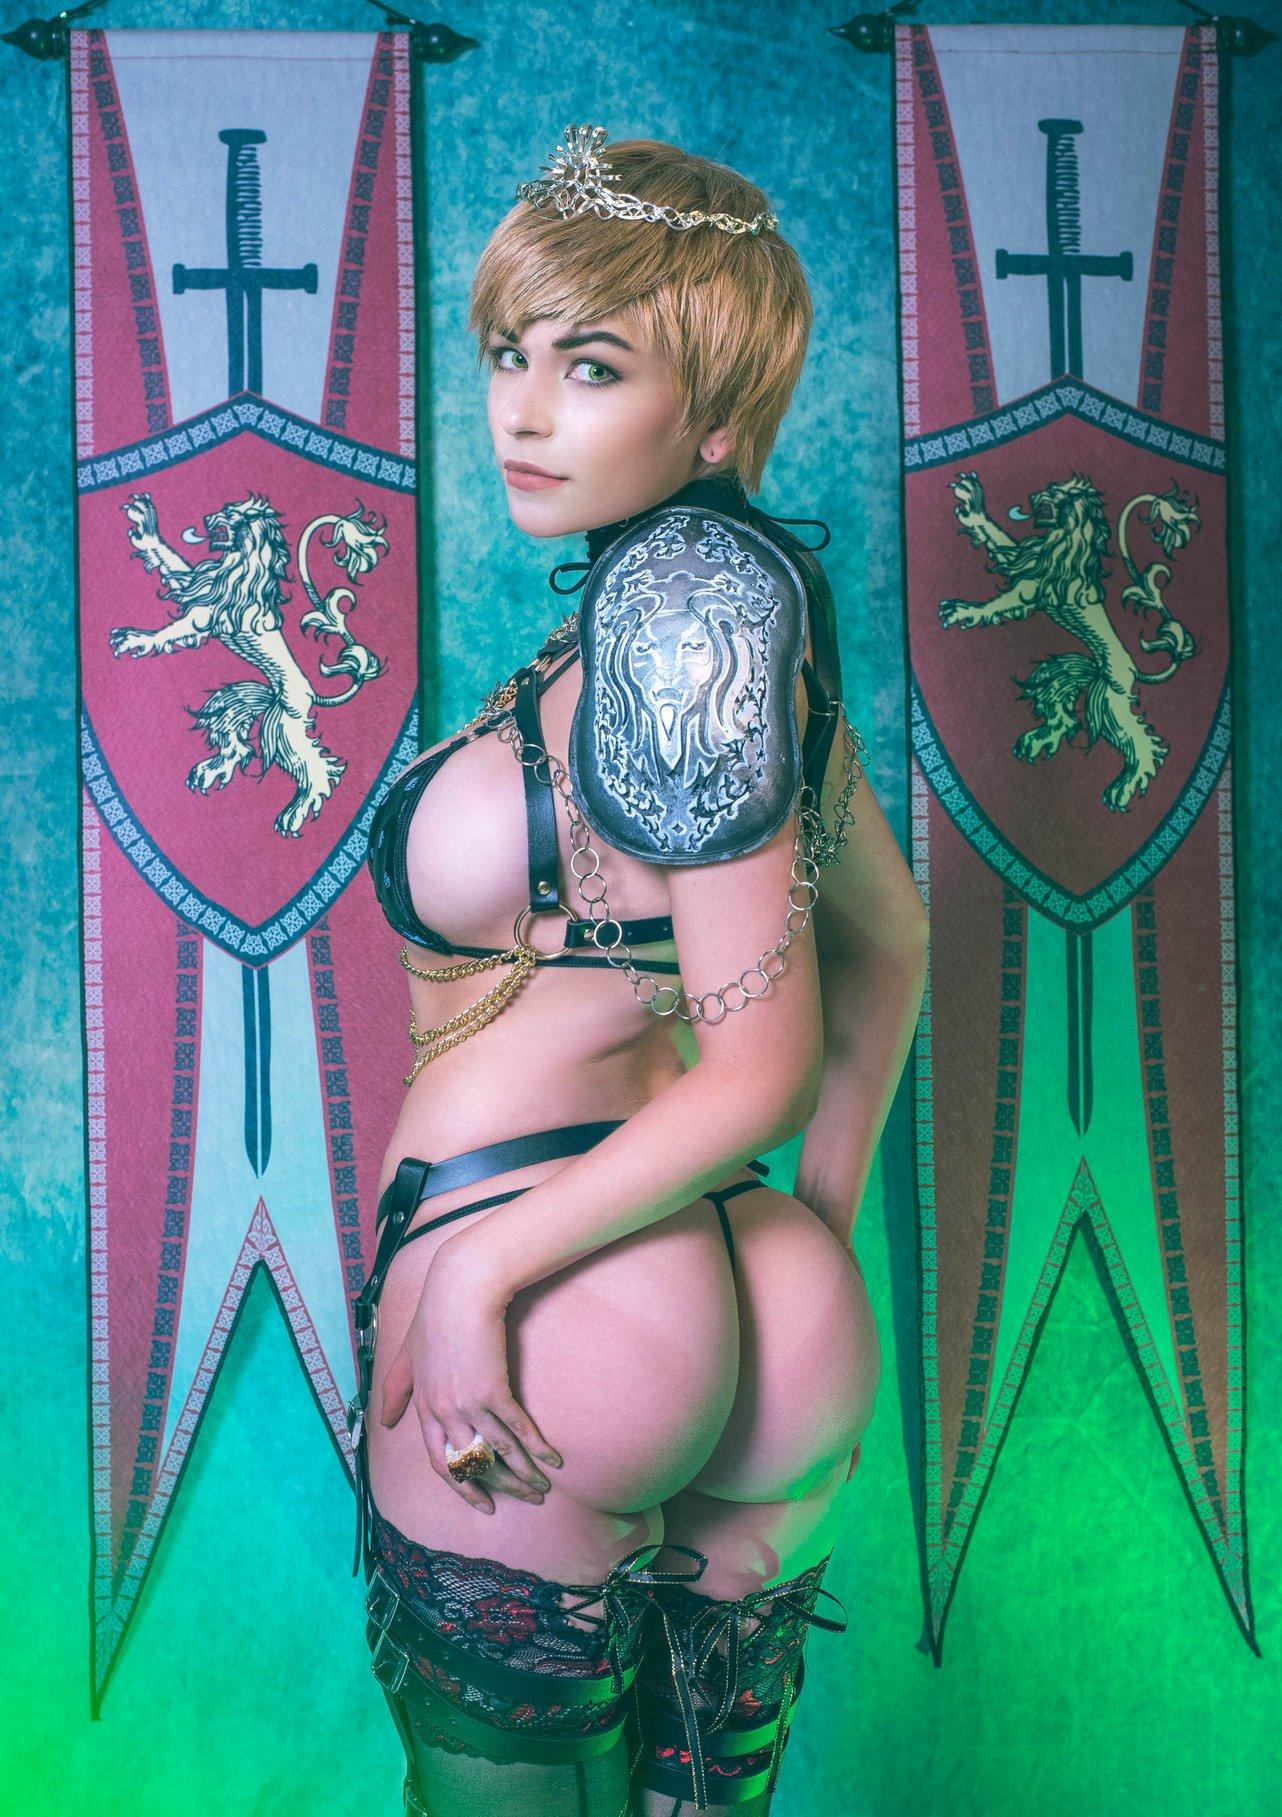 Danielle Beaulieu Daniellecosplay Onlyfans Nude Leaks 0045